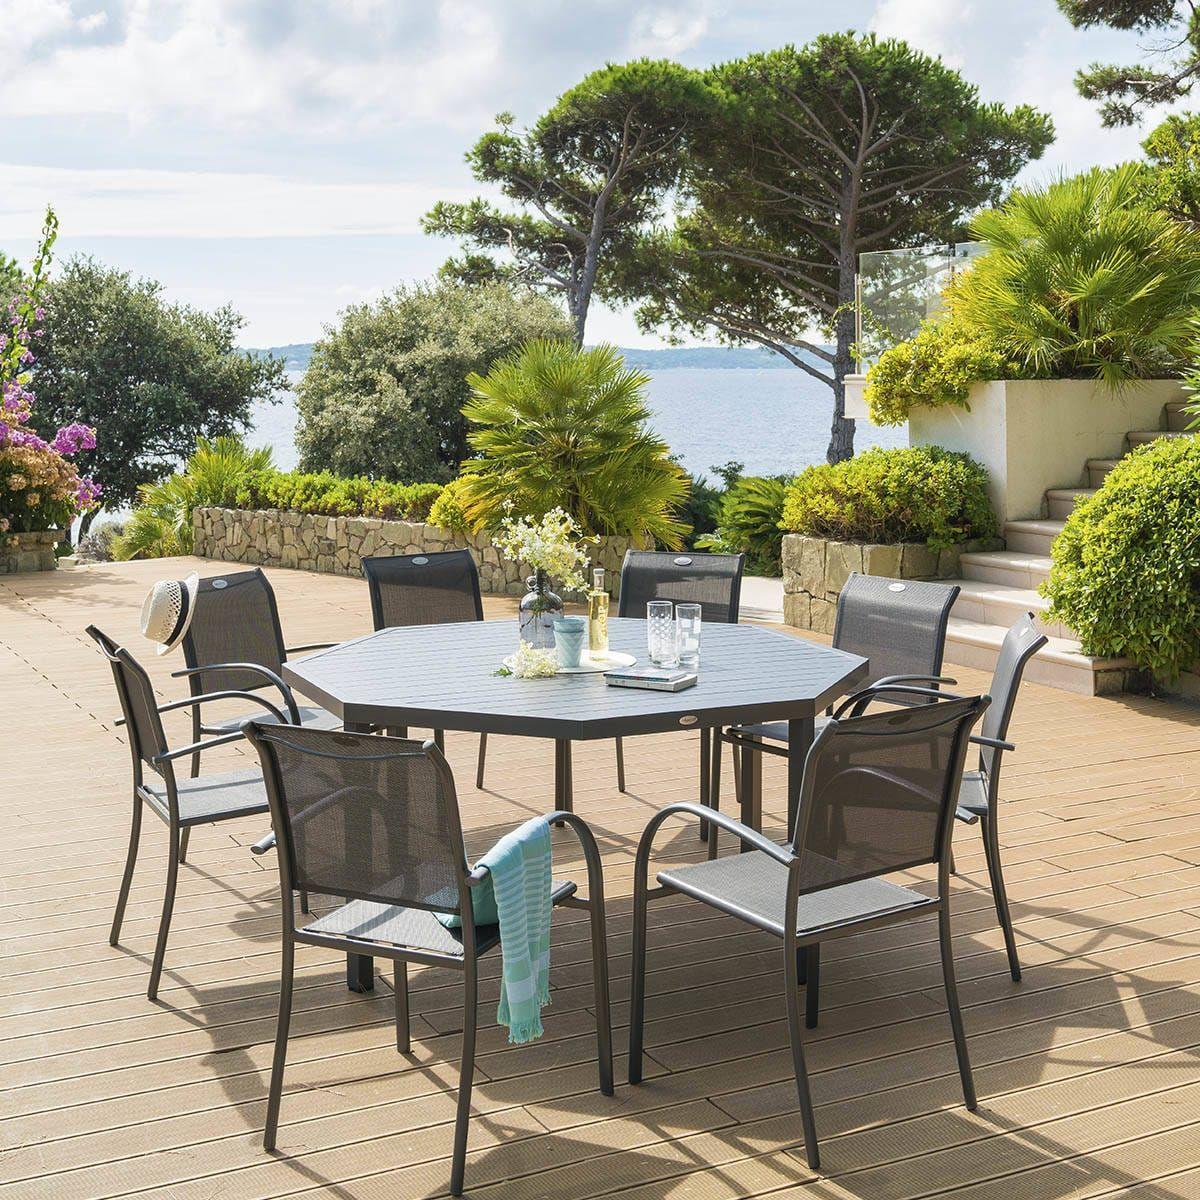 Table de jardin octogonale Piazza Graphite | salon. jardin | Outdoor ...